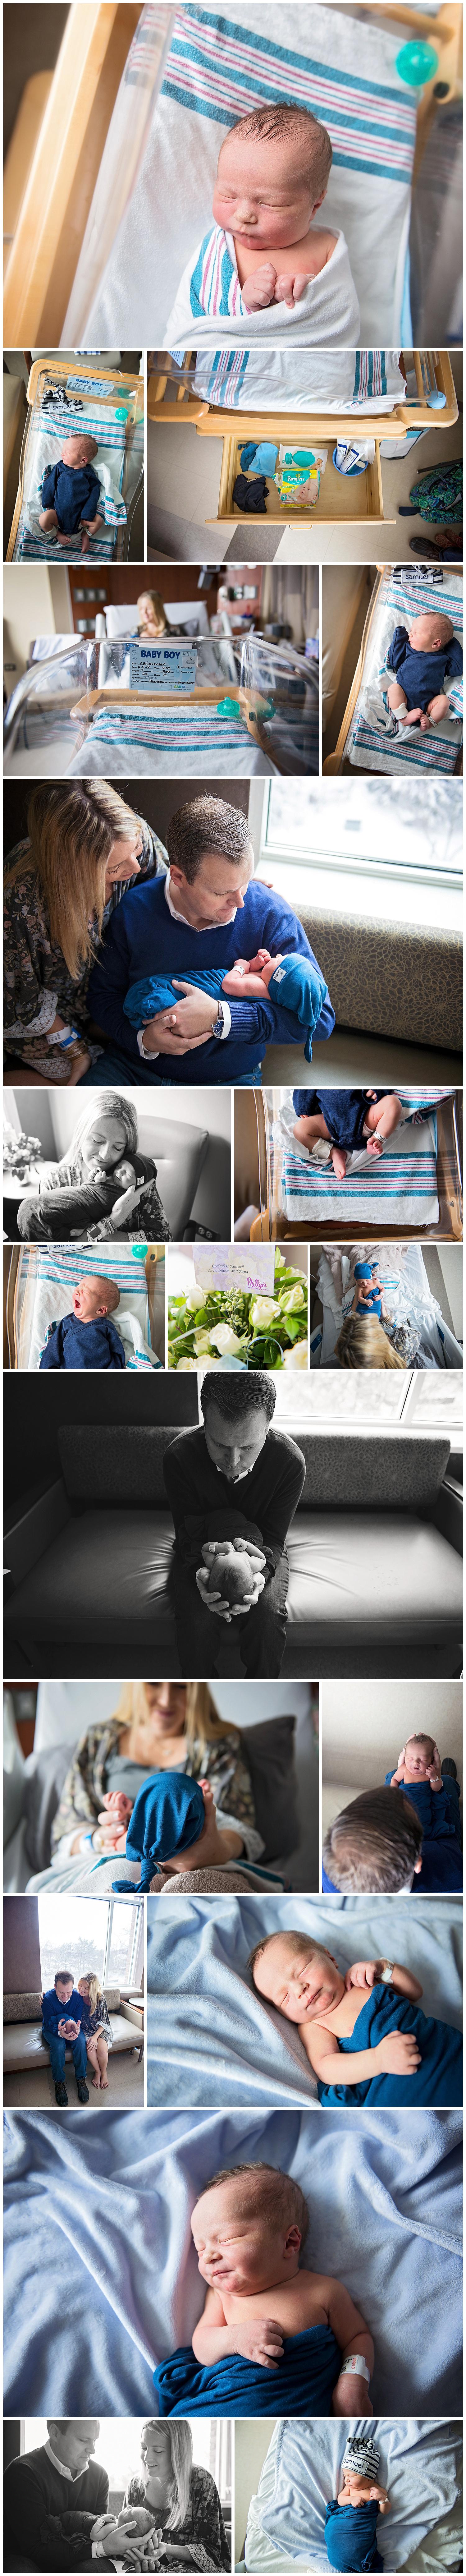 Hinsdale_Hospital_Photographer_Newborn_Fresh48.jpg